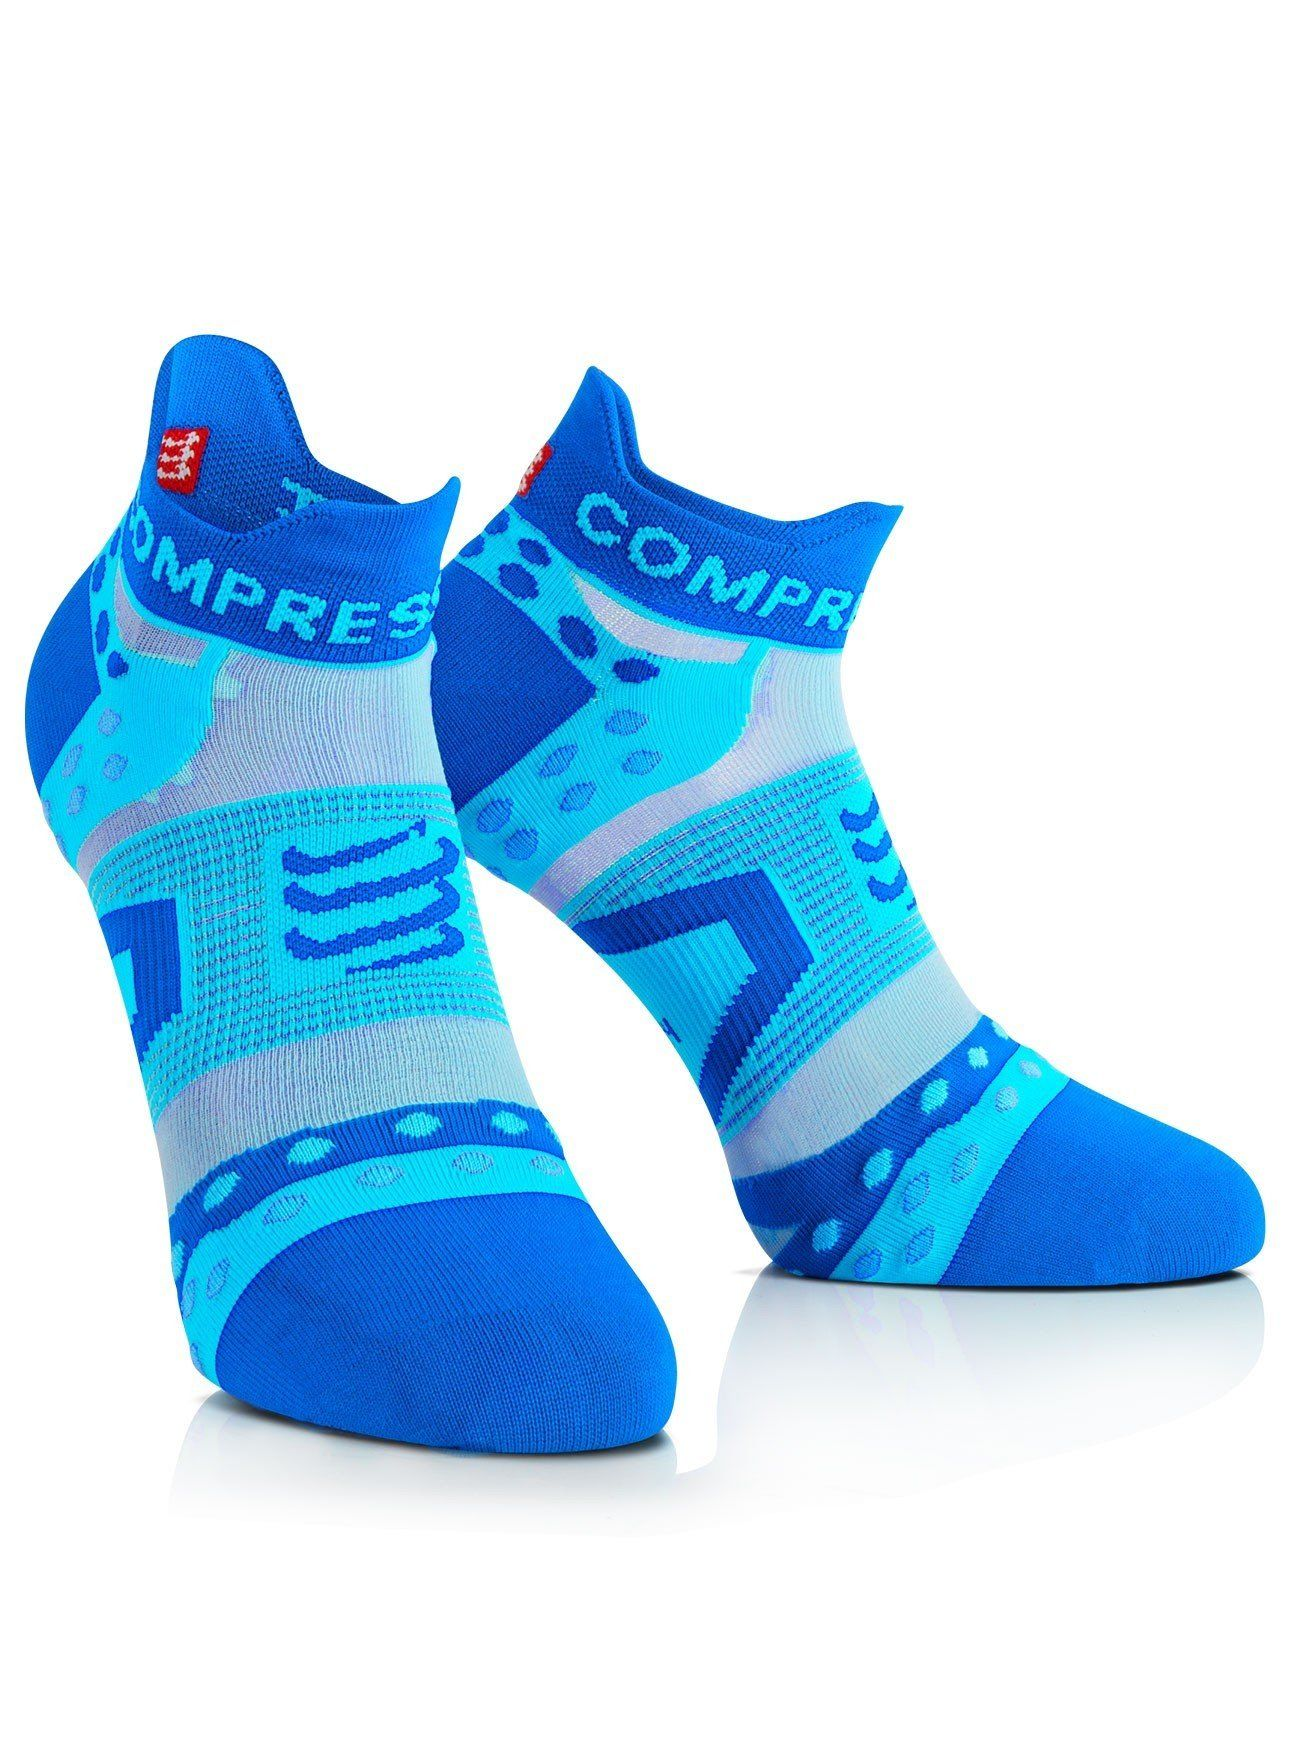 Eurosock Marathon Low Cut Running Socks Shields Feet from Harsh Impact Elastic Arch Band Support EU200